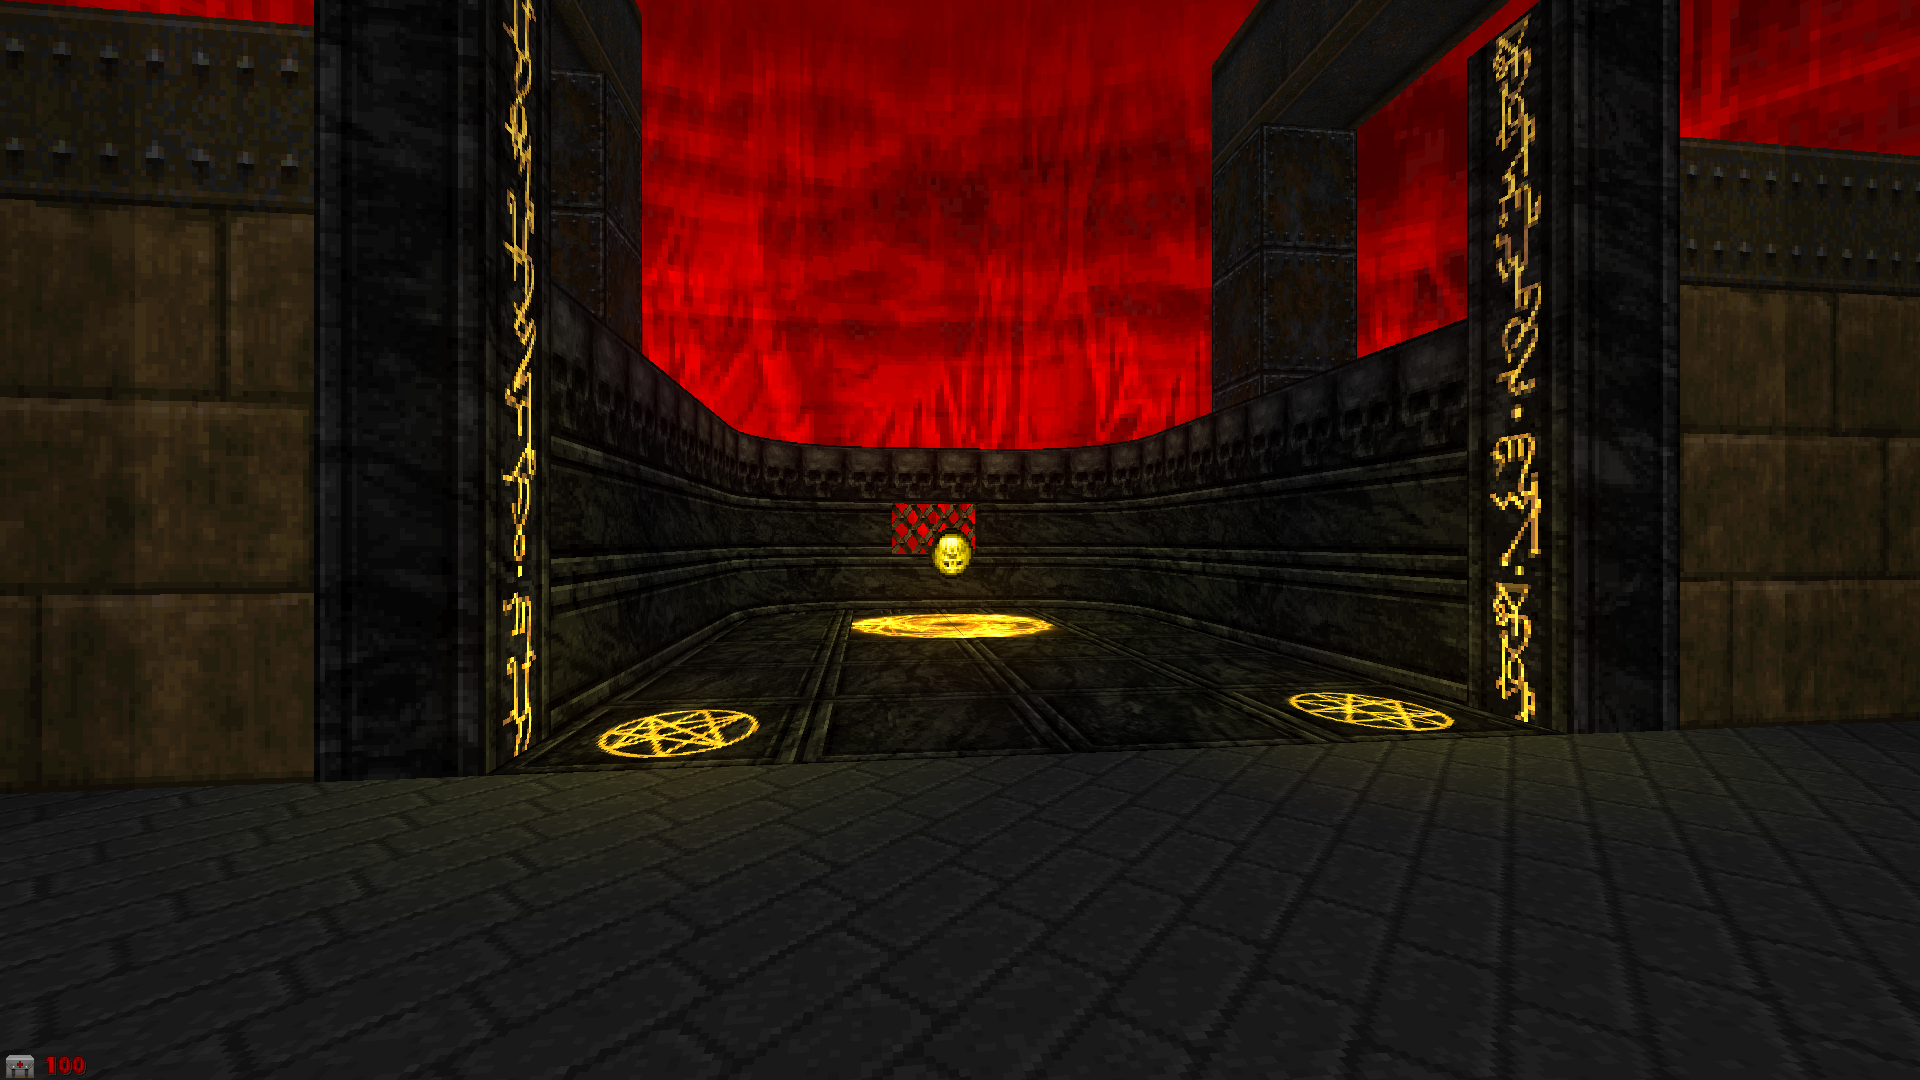 Screenshot_Doom_20191106_000612.png.8c7c055f36d5ad0e891e1ea9d9e5008f.png